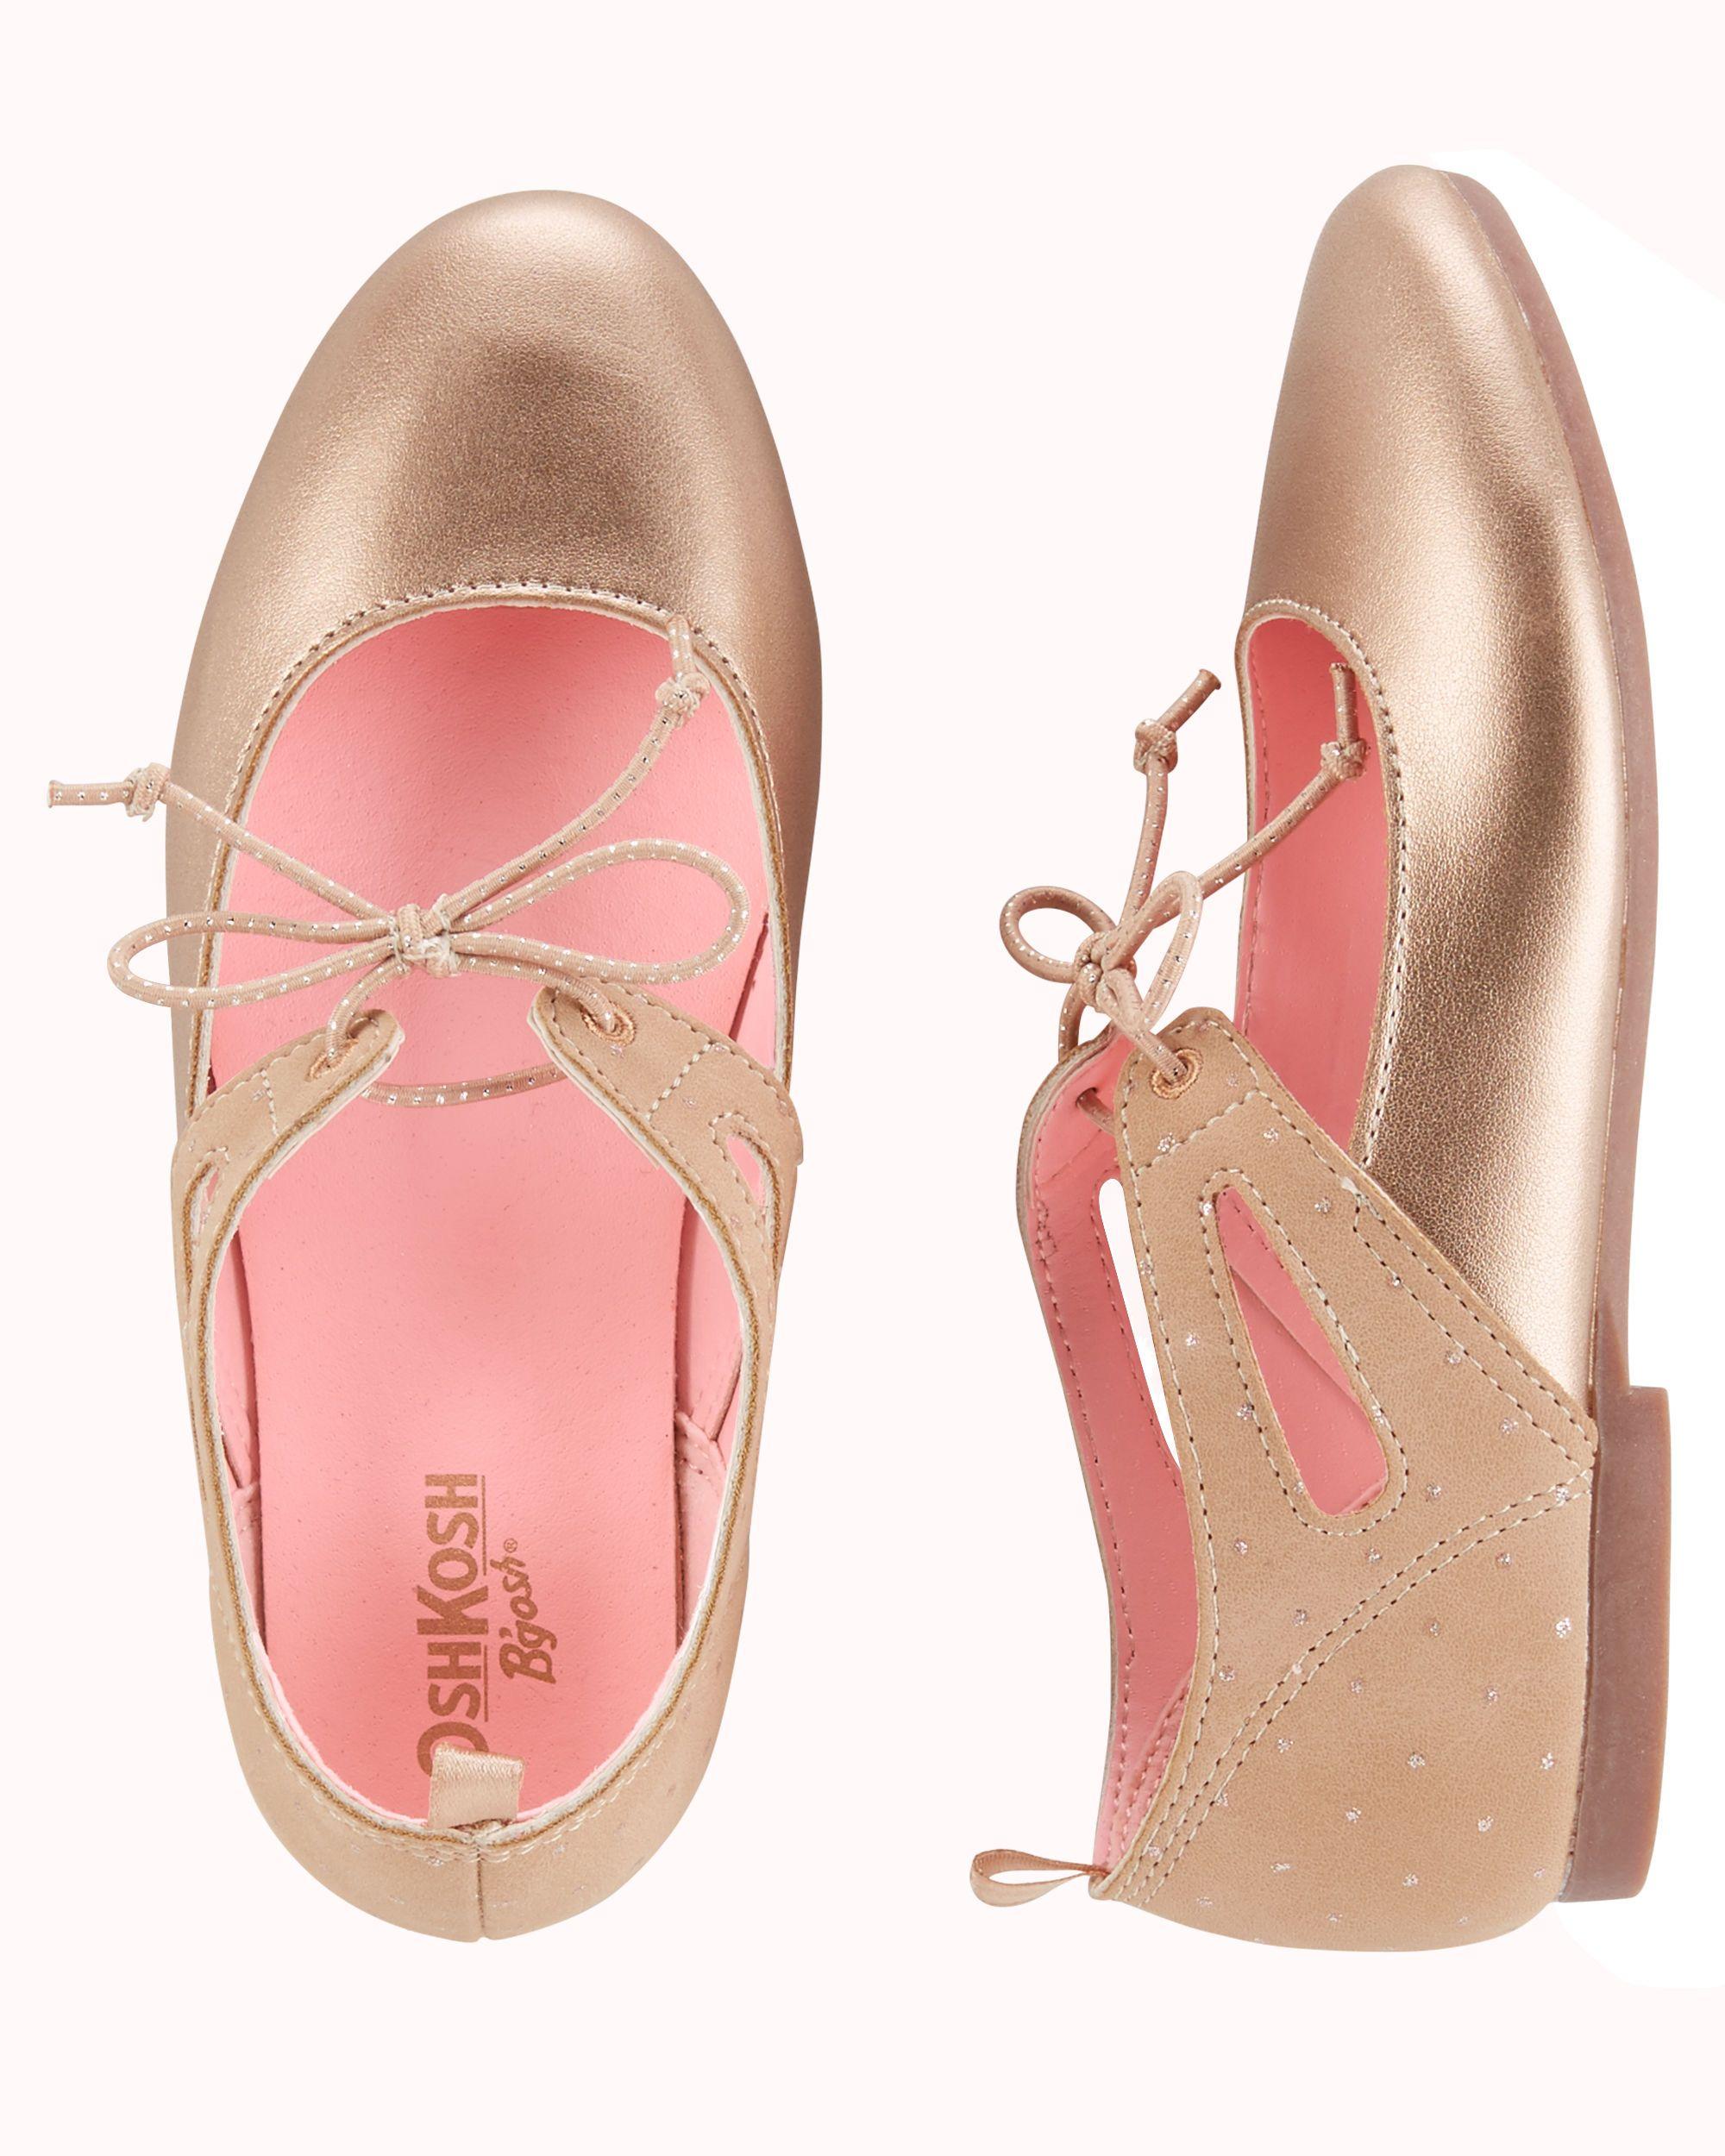 Toddler stylish girl shoes foto